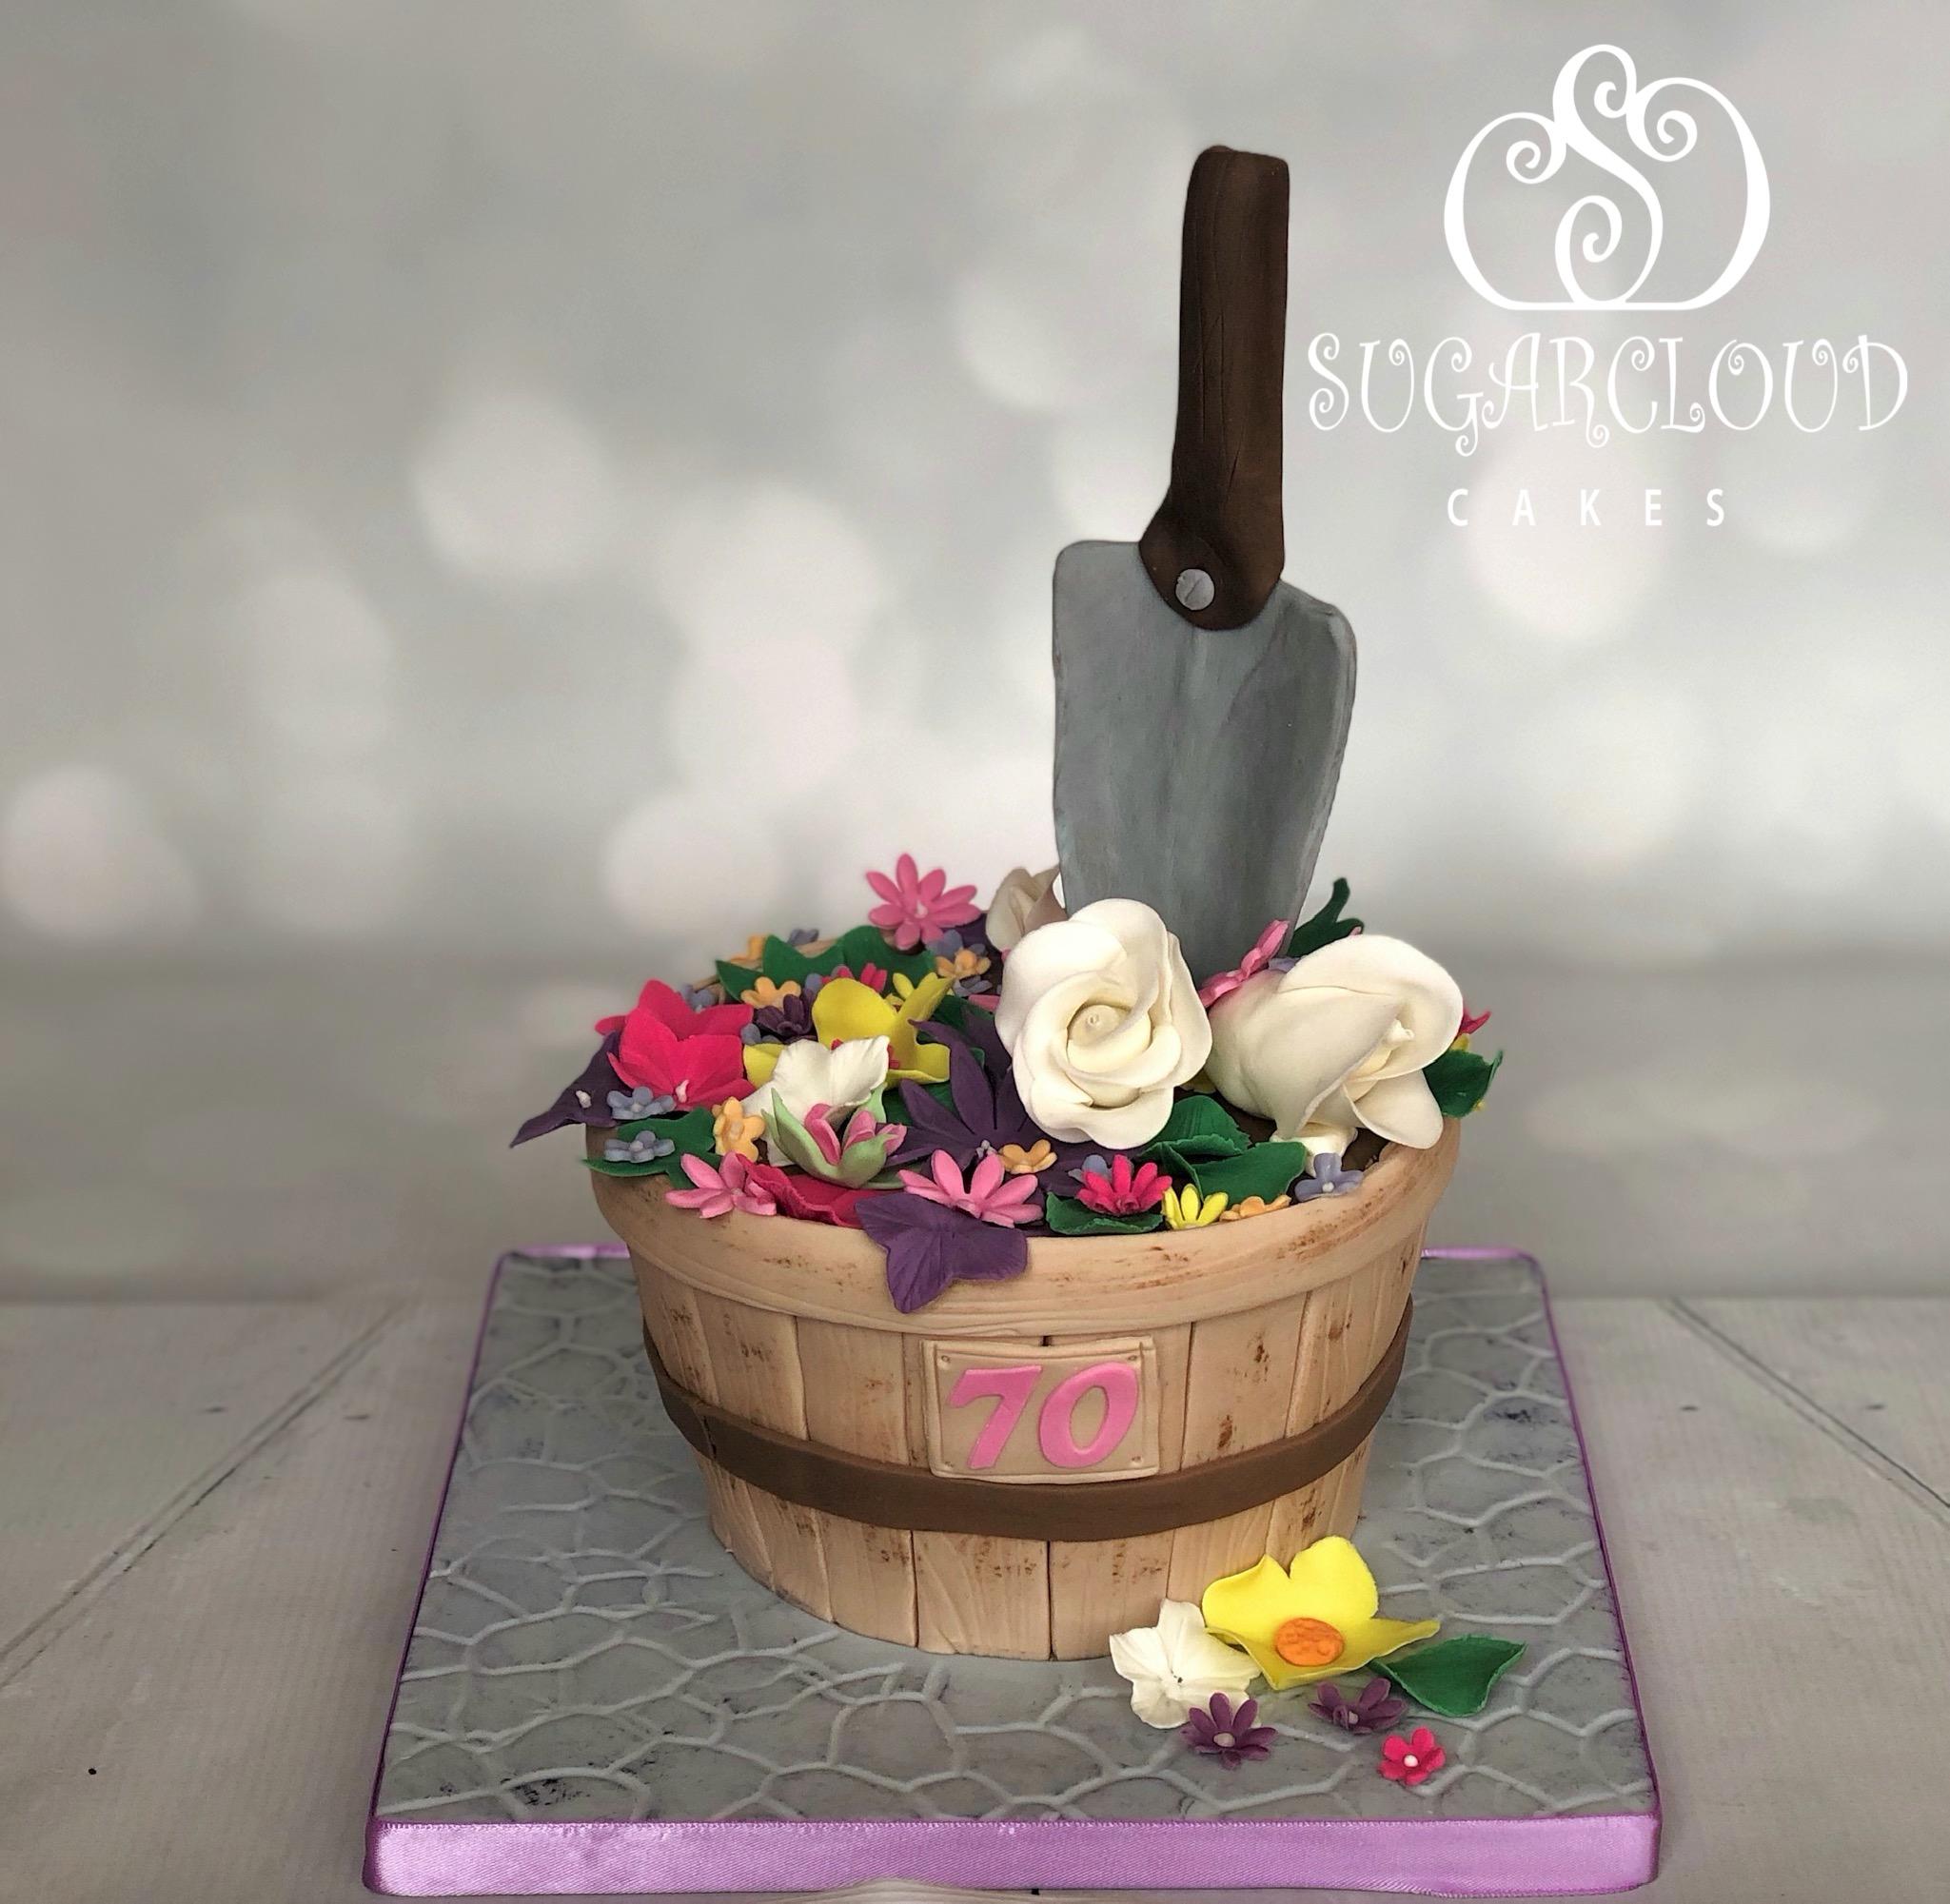 A 70th Birthday Gardening Themed Cake, Calveley